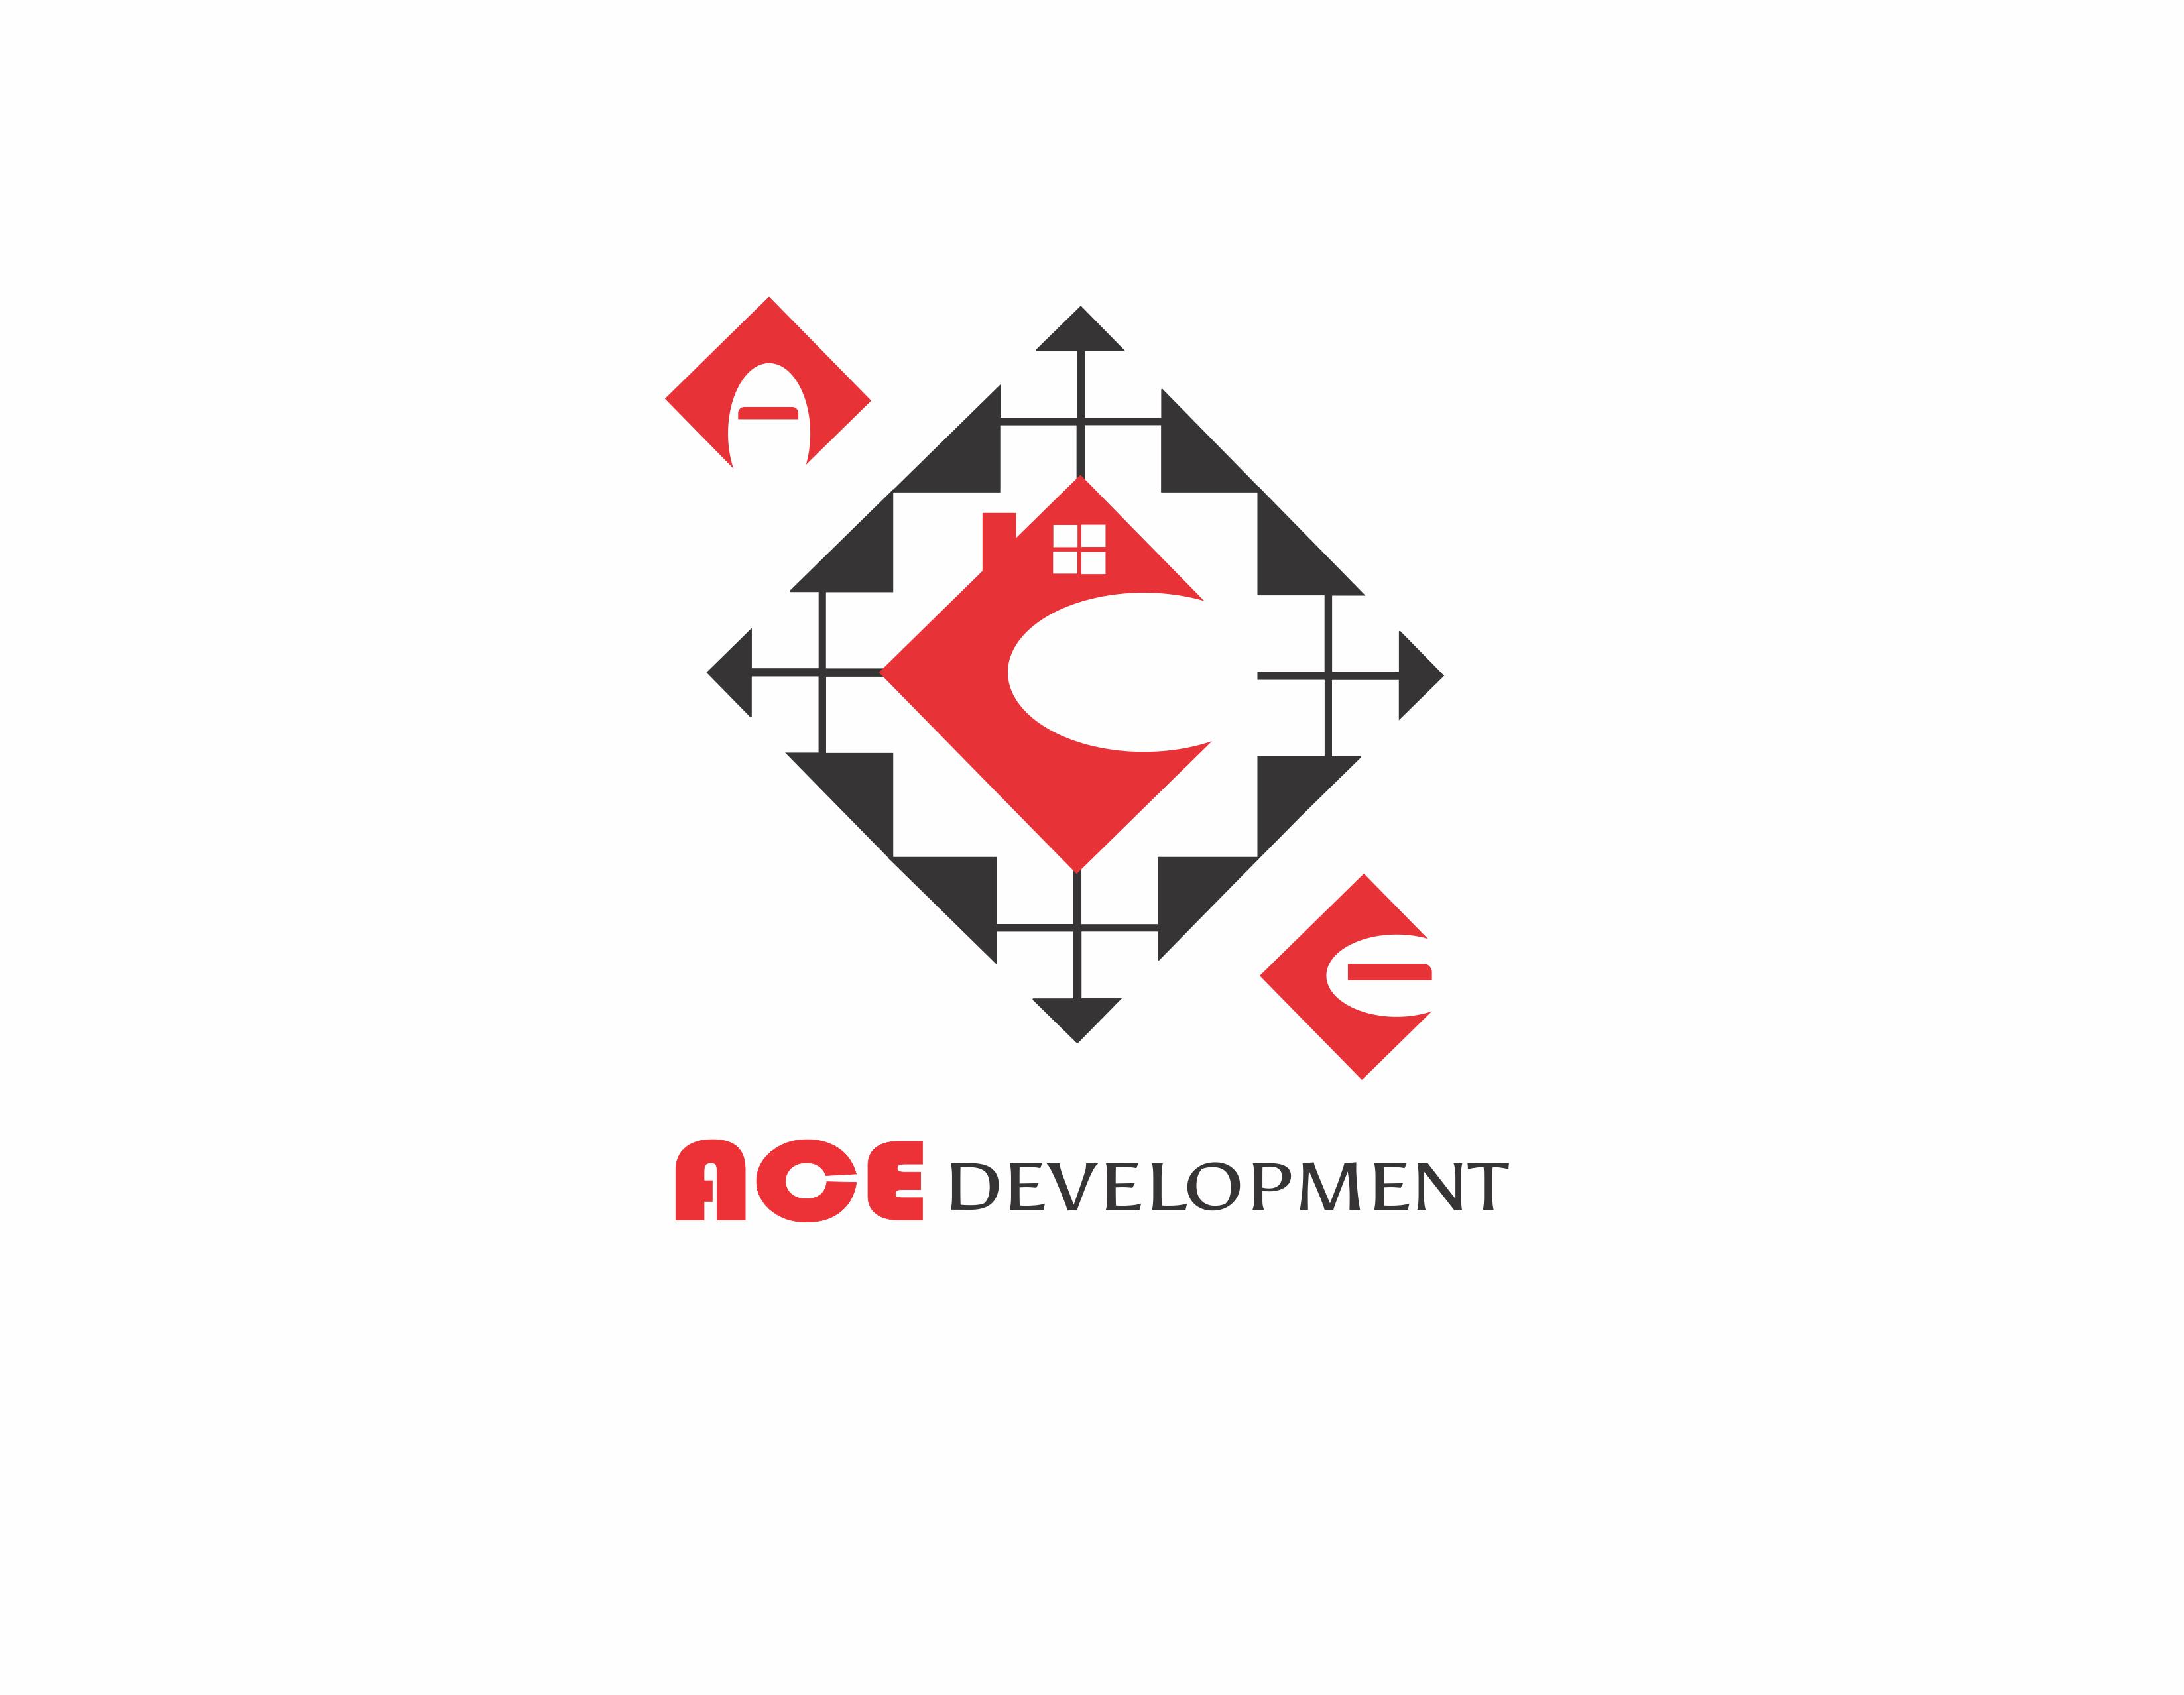 Logo Design by Rudy Permana - Entry No. 82 in the Logo Design Contest Fun Logo Design for Ace development.